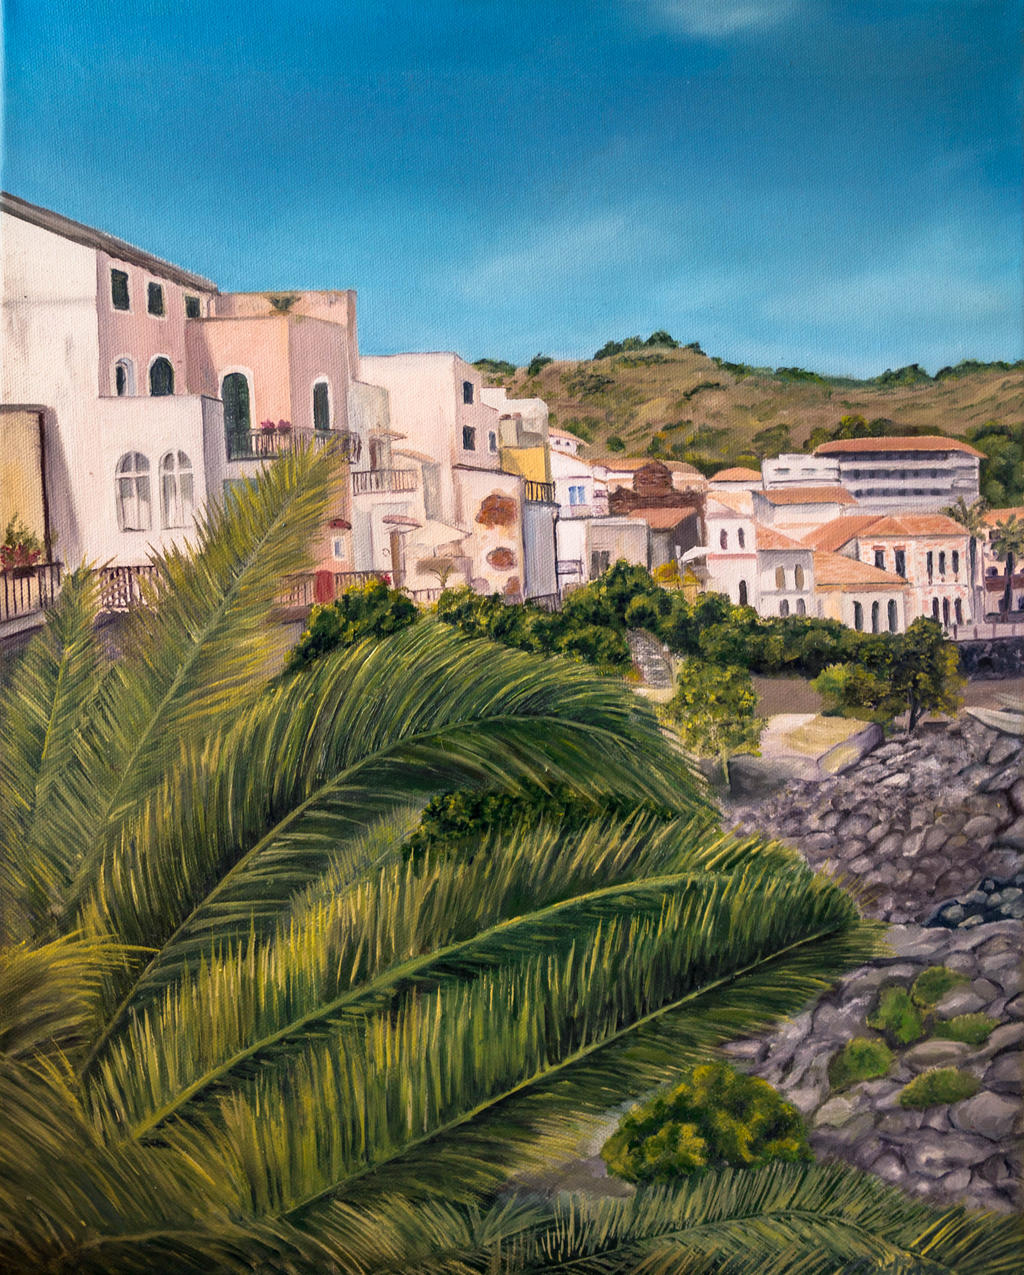 Sicily by cristineny